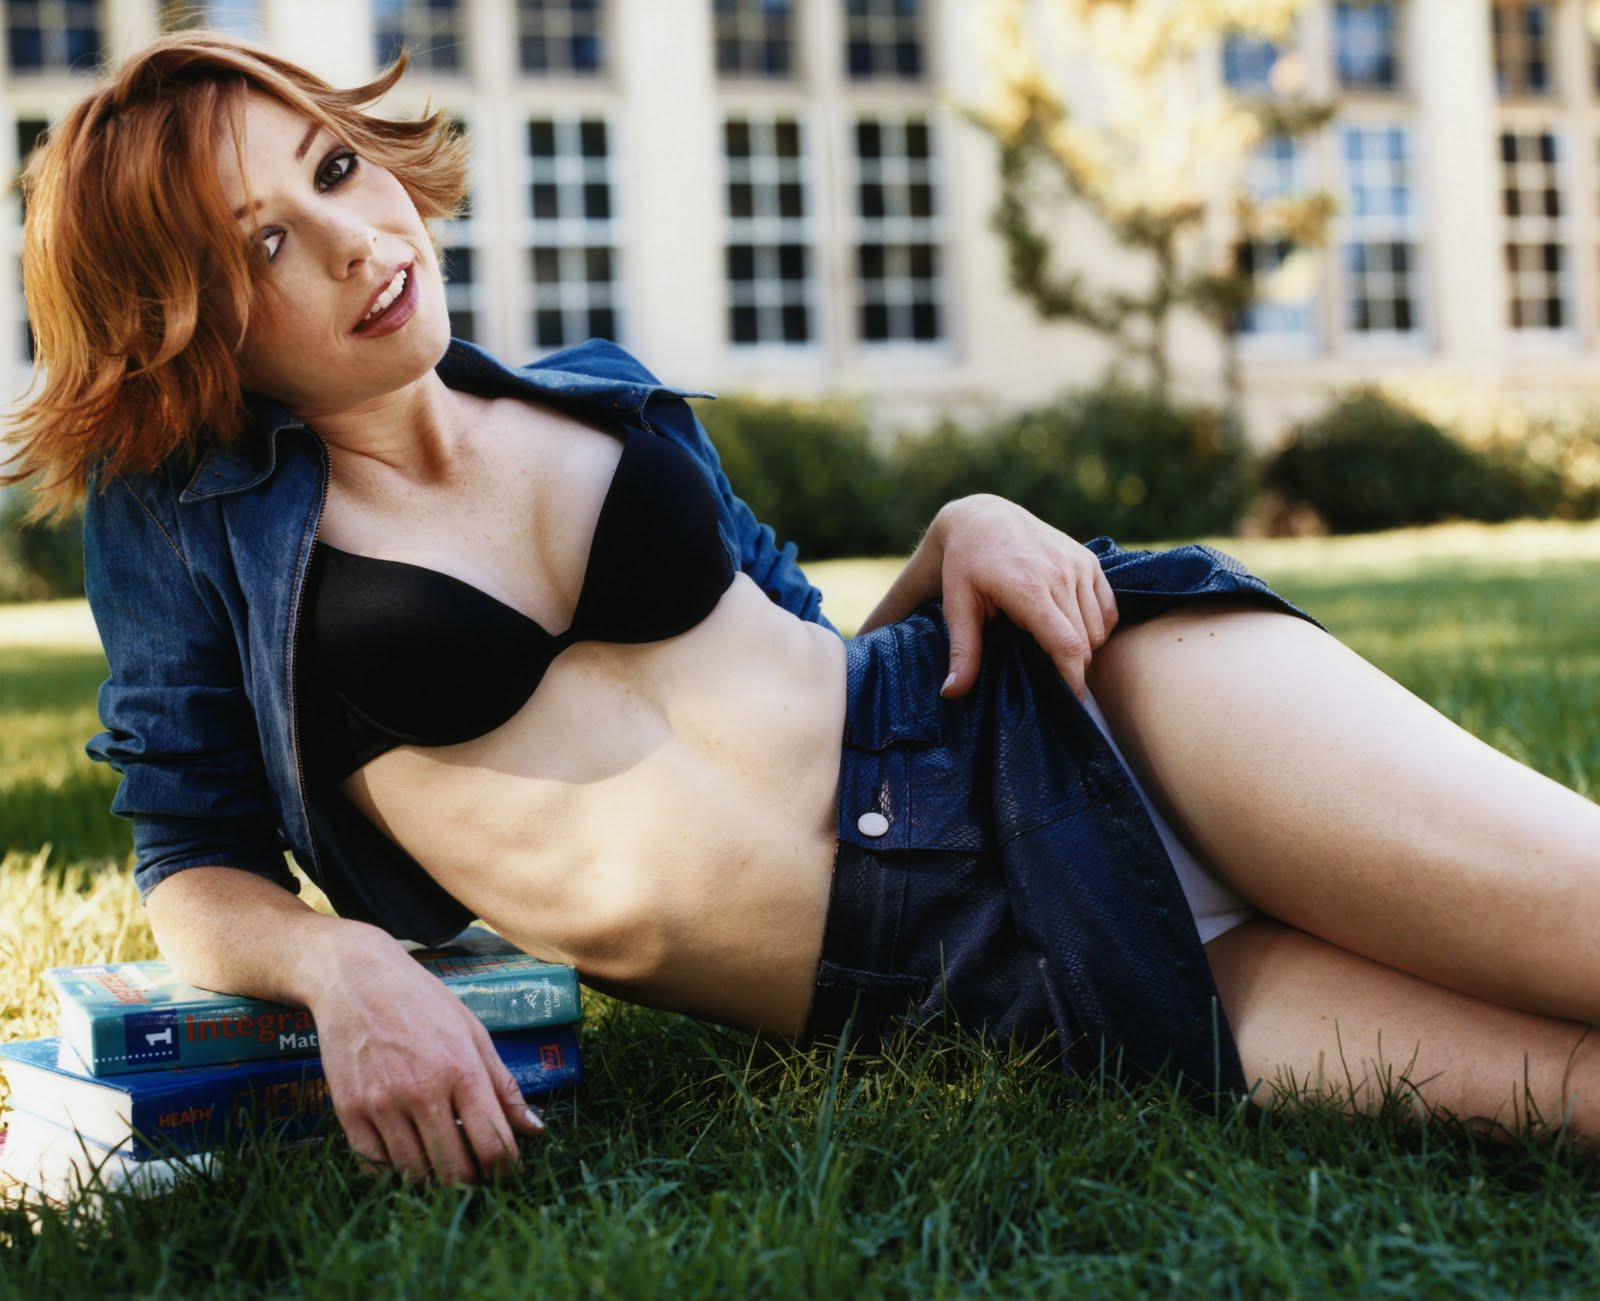 Alyson Hannigan Photoshoot fertyles: alyson hannigan - fhm uk photoshoot 2001